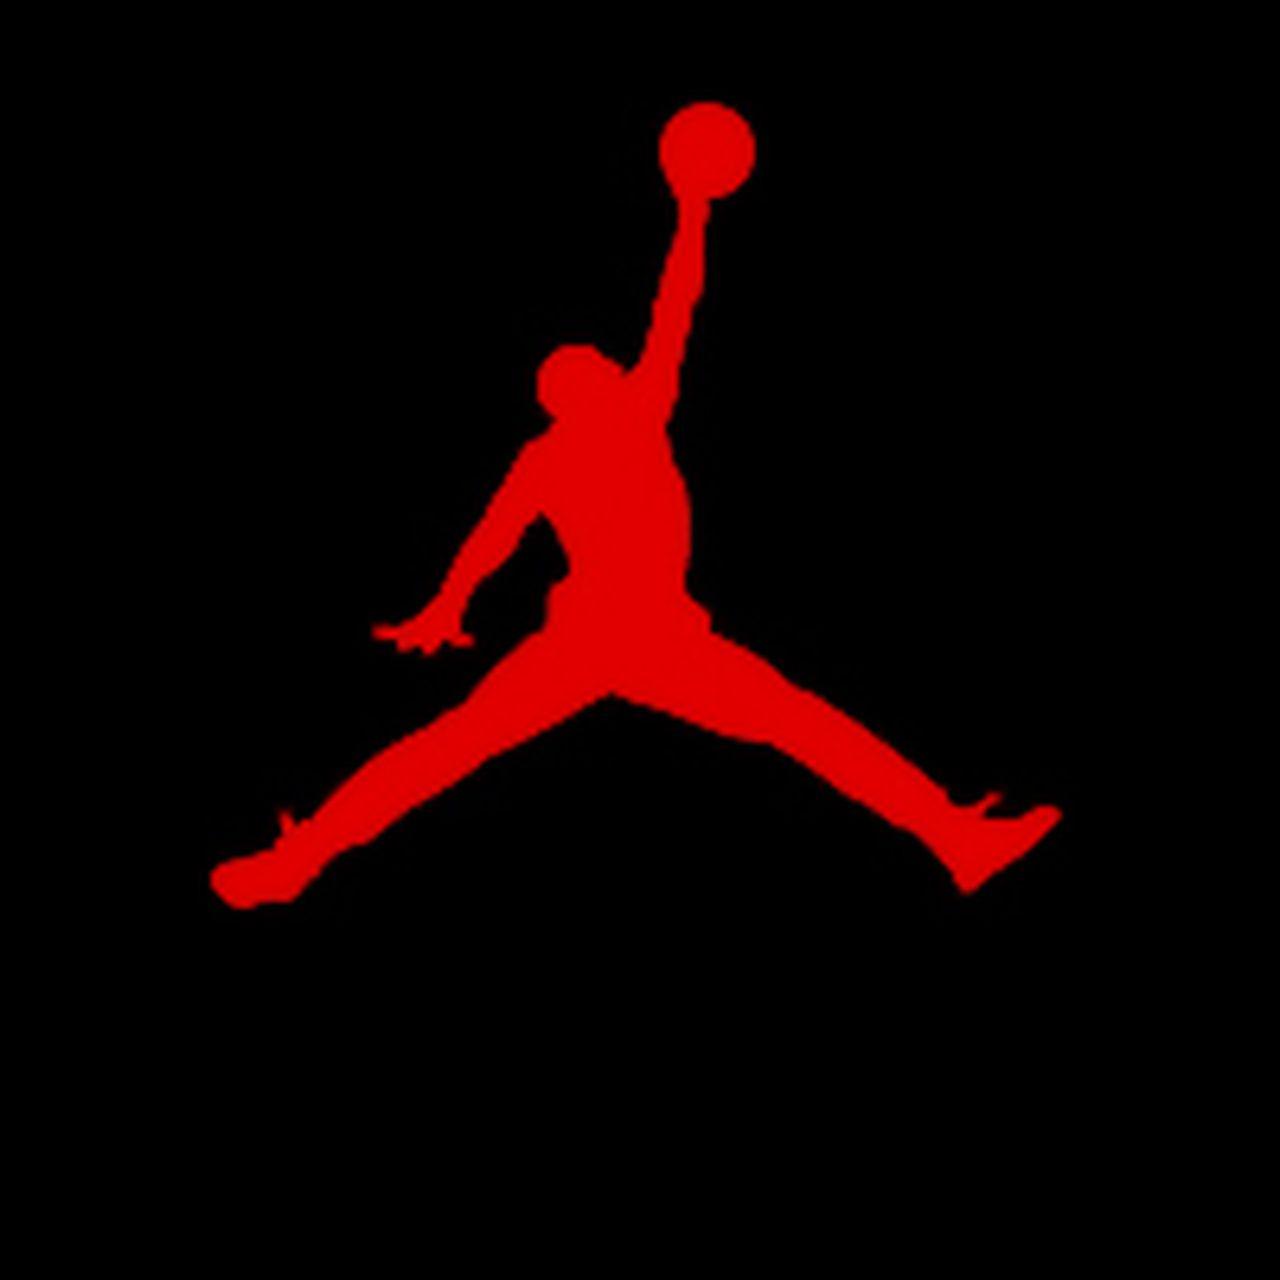 air jordan logo ipod wallpaper design